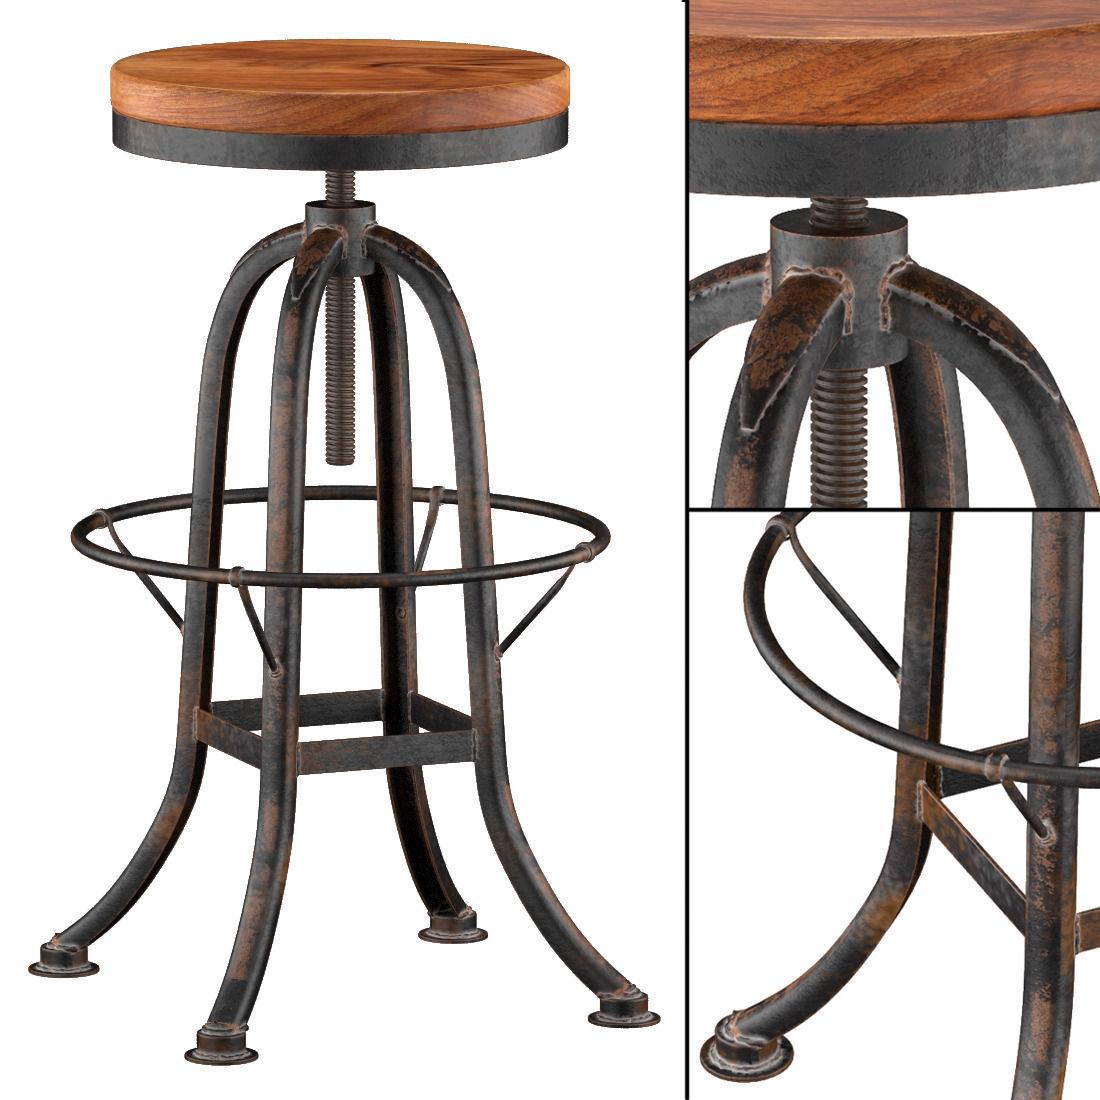 Oleg Loft Iron Base Reclaimed Wood Bar Counter Stool Model